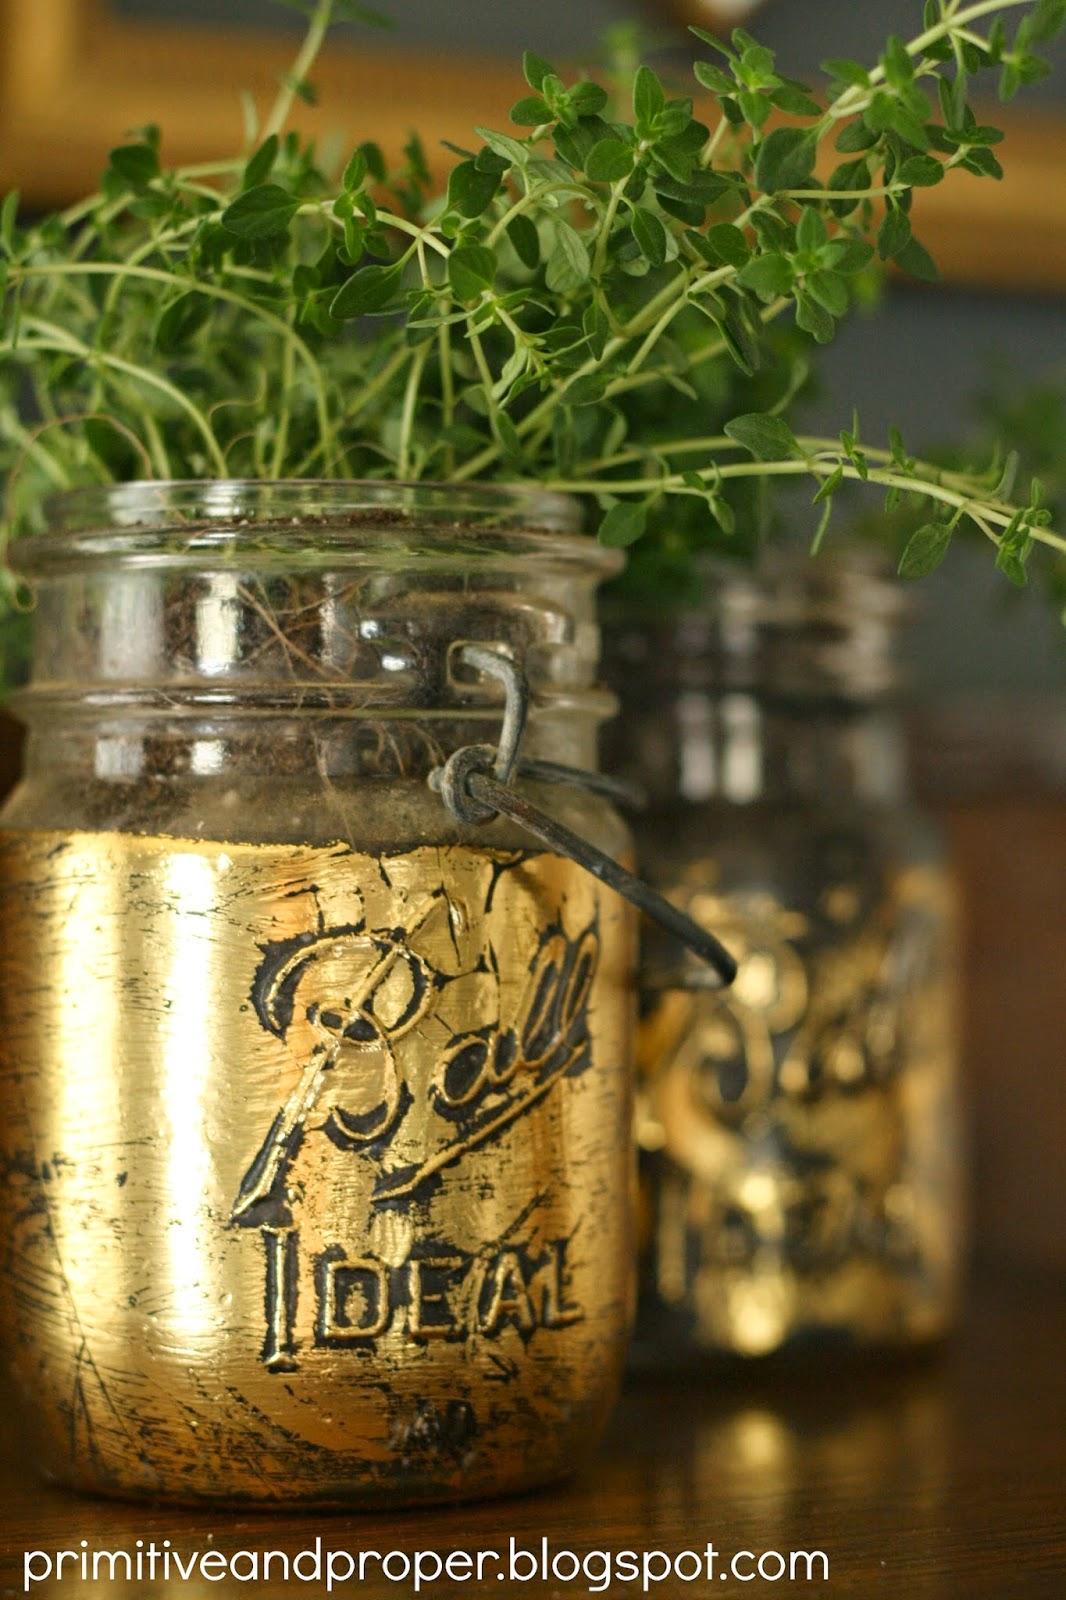 http://primitiveandproper.blogspot.com/2014/04/gold-leaf-mason-jar-planters-spring.html